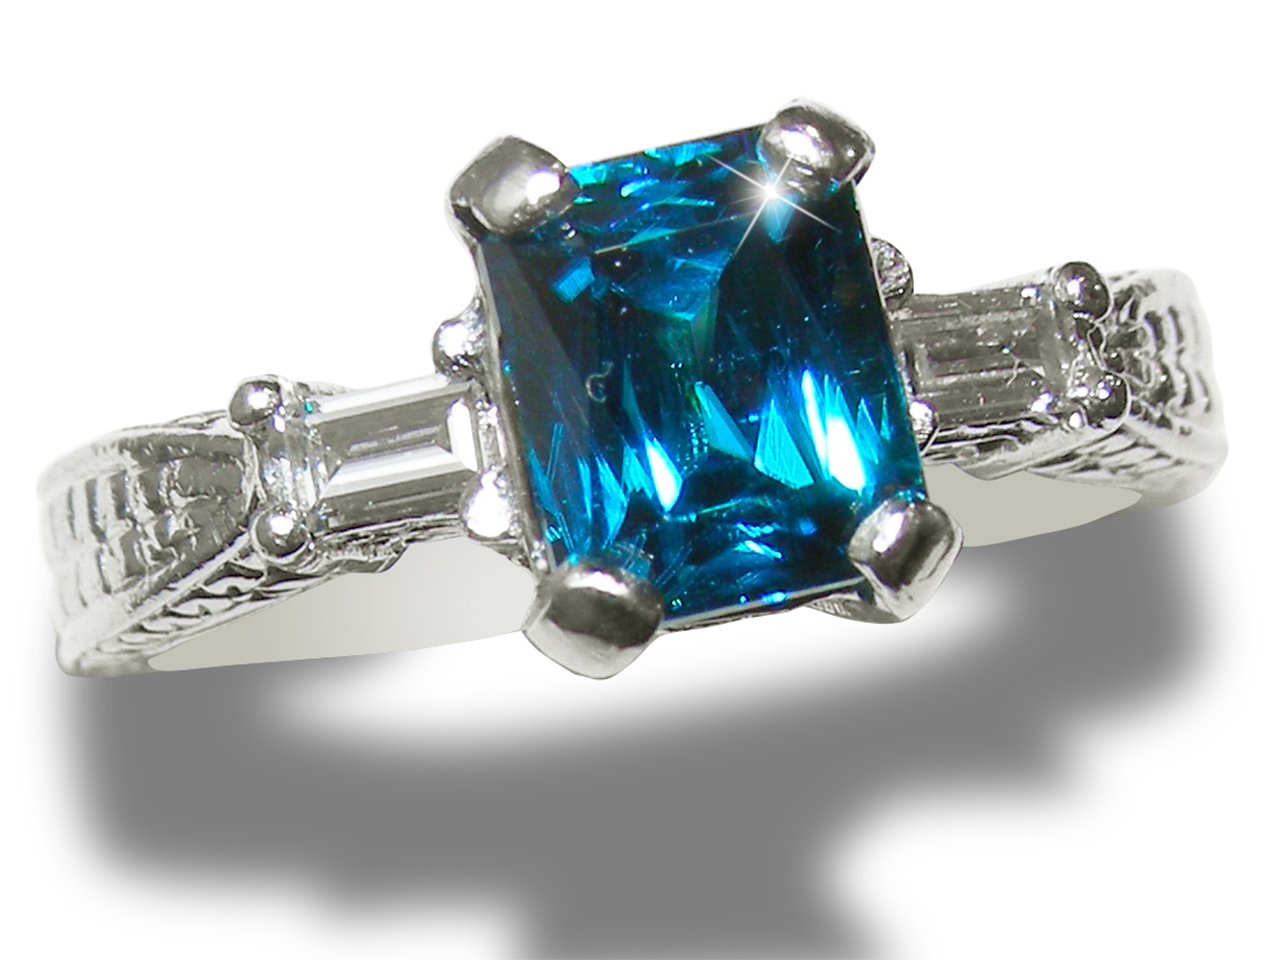 Deep Blue Fancy Radiant Cut Blue Zircon Platinum Diamond Ring 2.47 ctw